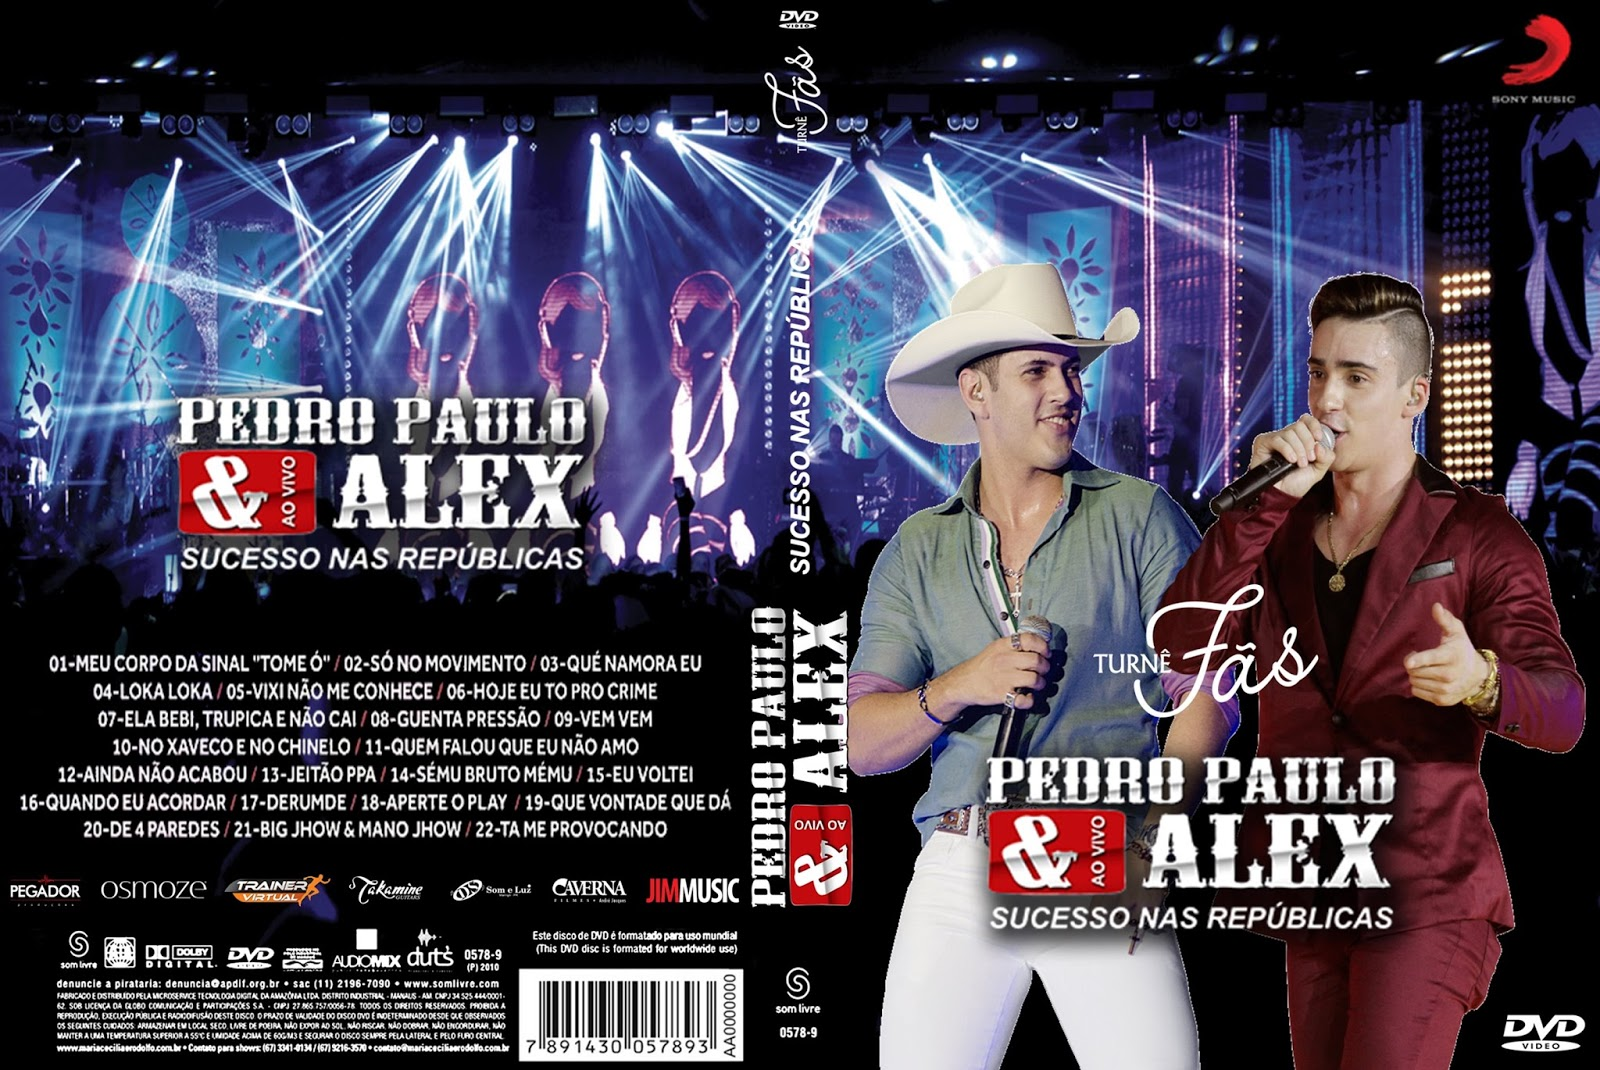 Download Pedro Paulo & Alex Sucesso Nas Republicas Turnê Fâs DVD-R Pedro 2BPaulo 2B 2526 2BAlex 2B  2BSucesso 2BNas 2BRepublicas 2B  2BTurn 25C3 25AA 2BF 25C3 25A2s